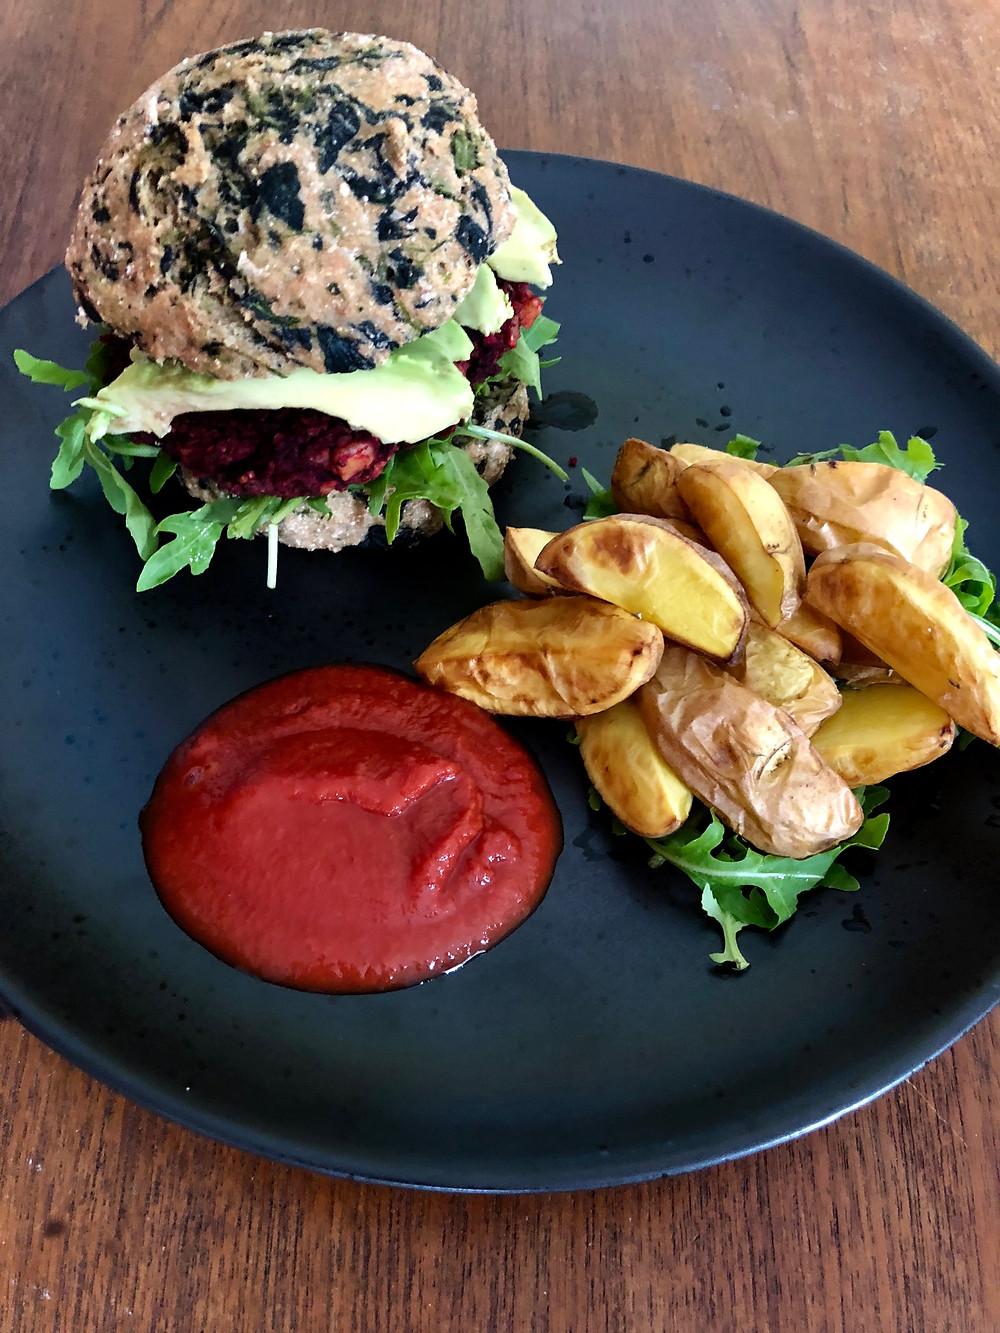 Rødbedebøf, spinatburgerbolle